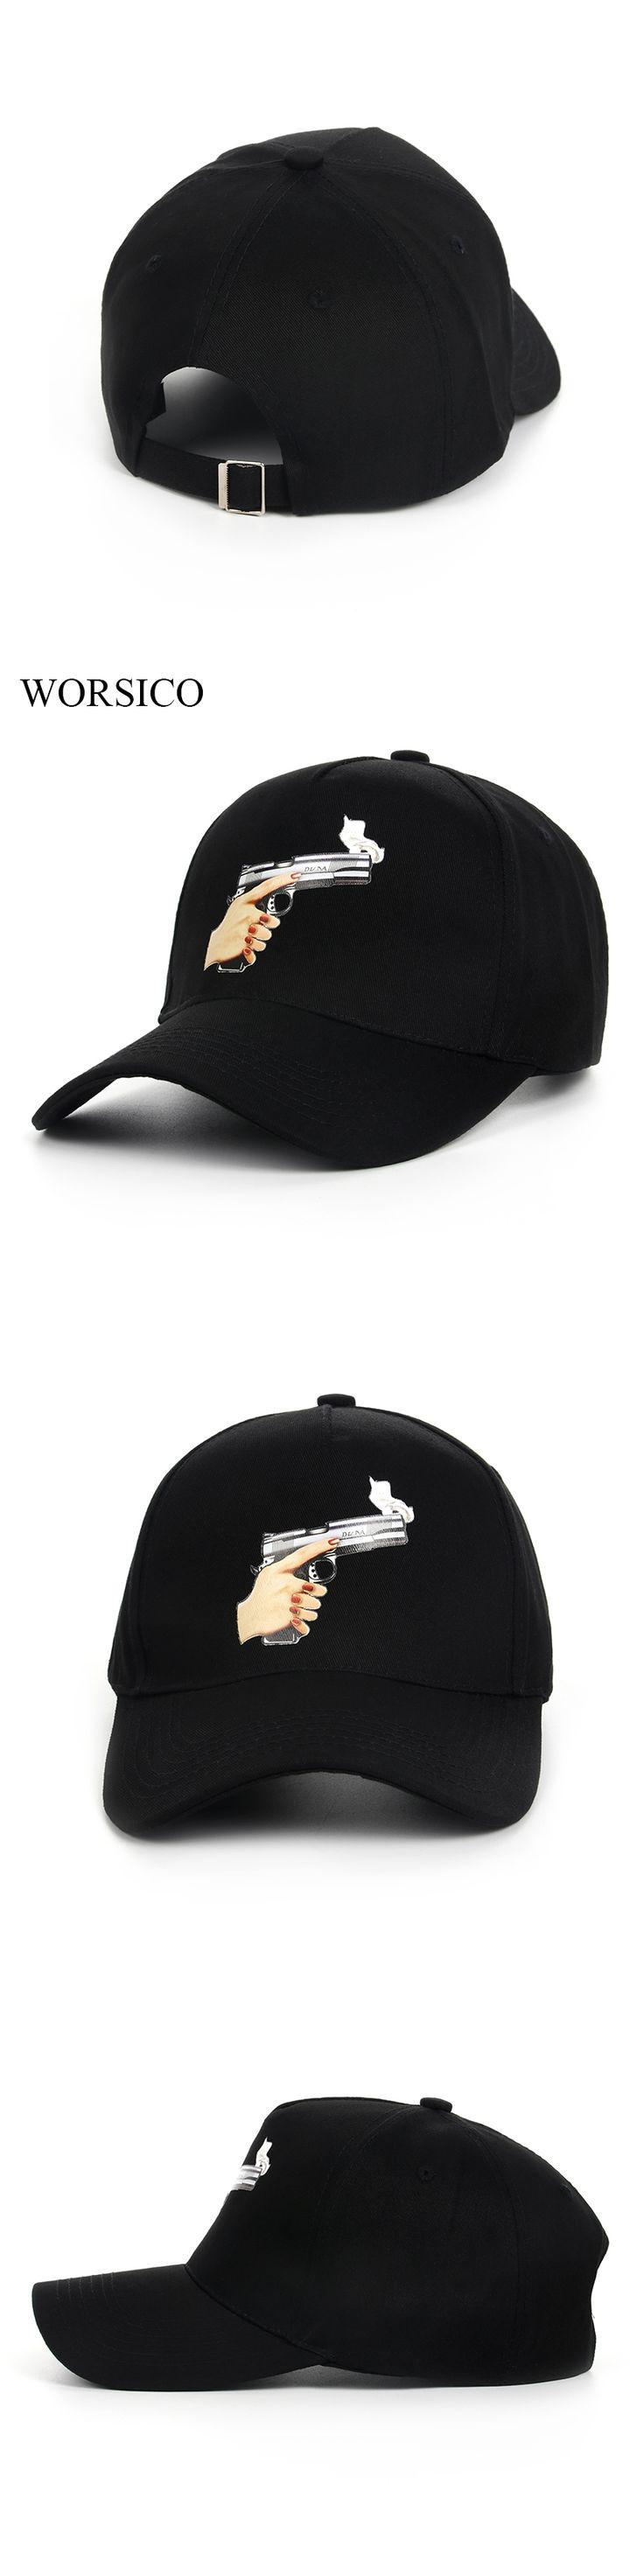 worsico top selling gun baseball cap men fashion 2017 snapback hip hop cap women curve visor hats casquette de marque